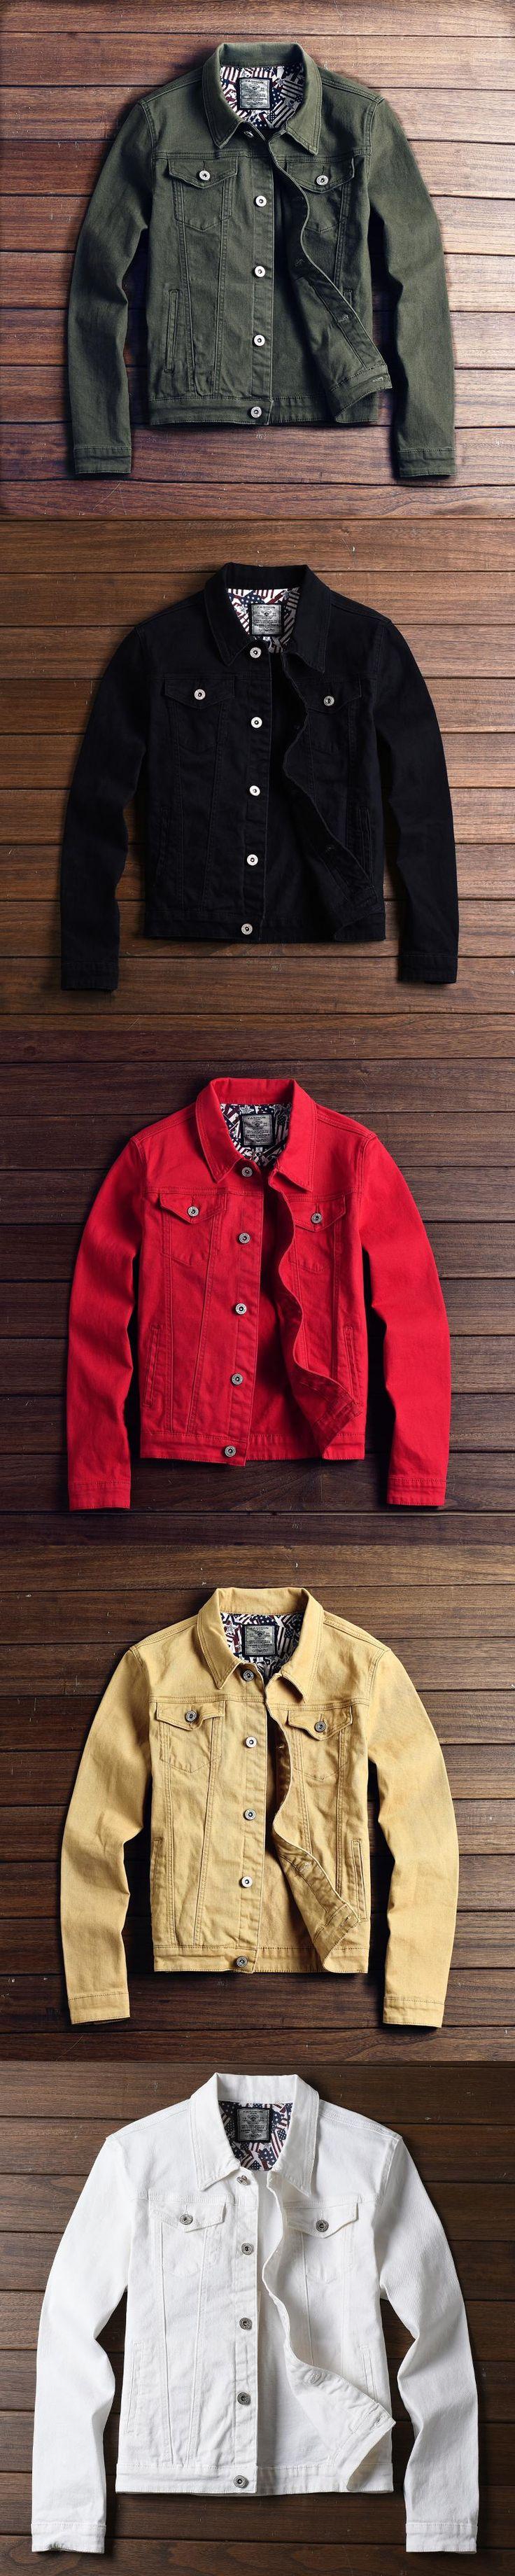 2017 New hot slim mens jackets and coats casual denim jacket men veste homme men jeans jacket male khaki black army green red